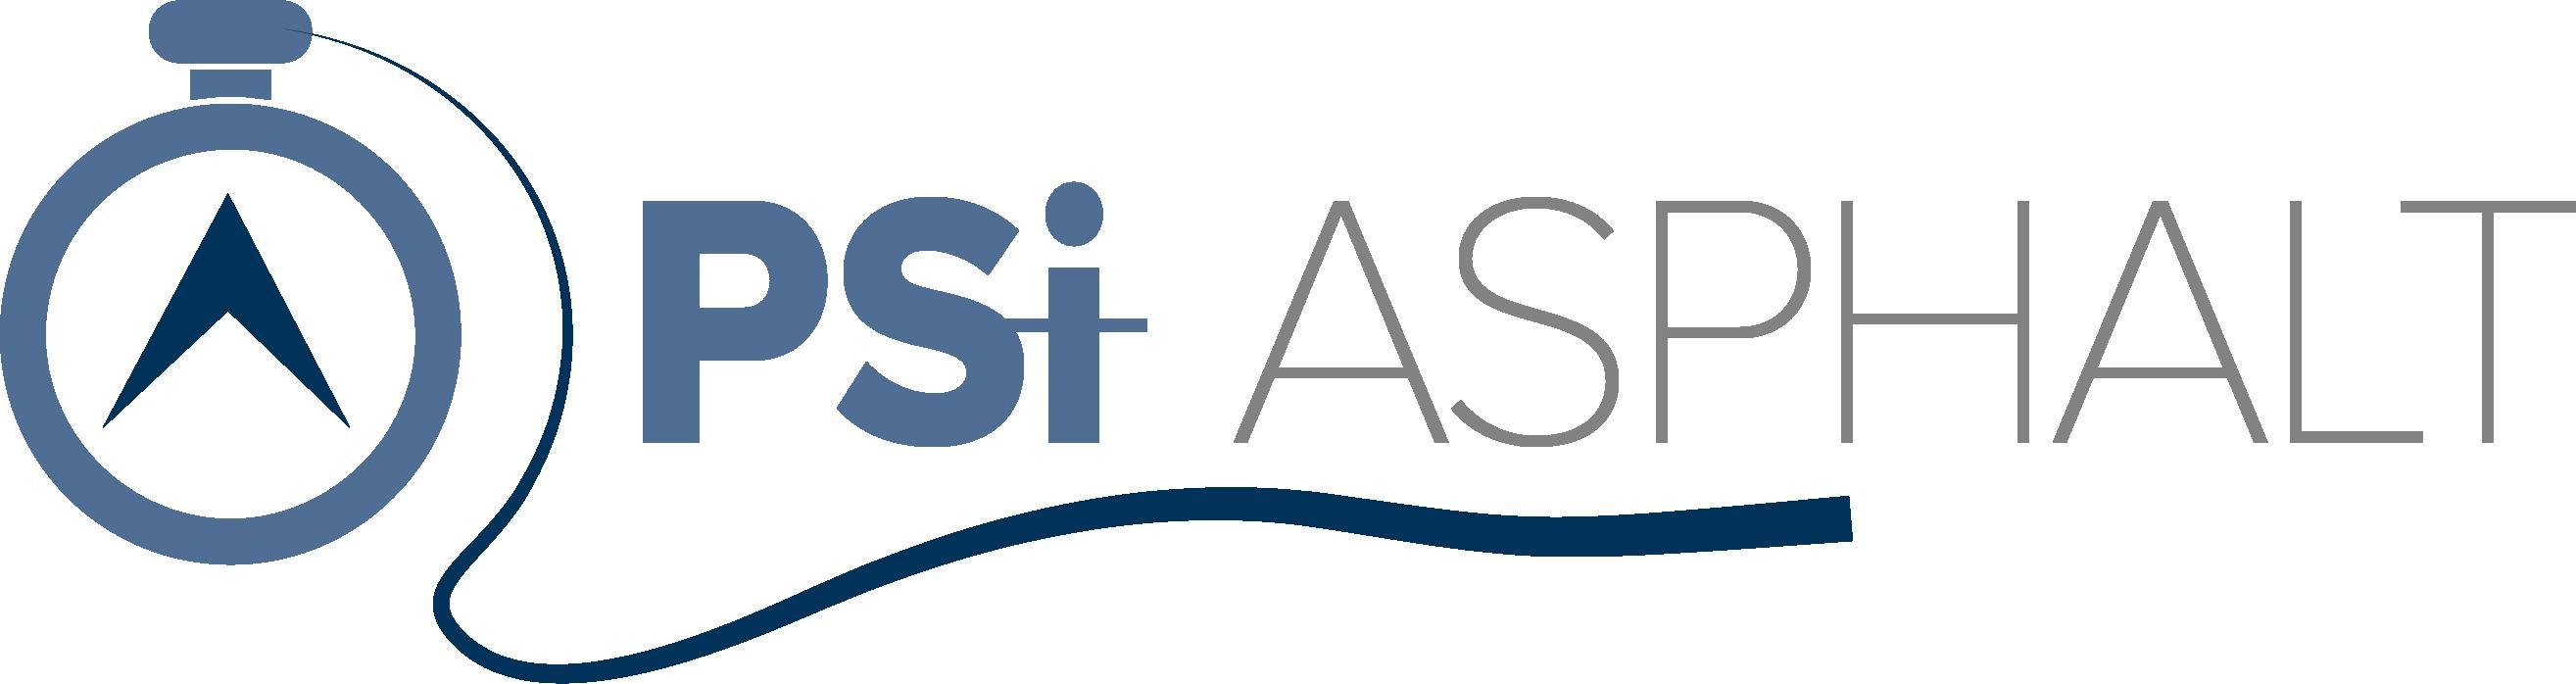 psi asphalt 2019 logo